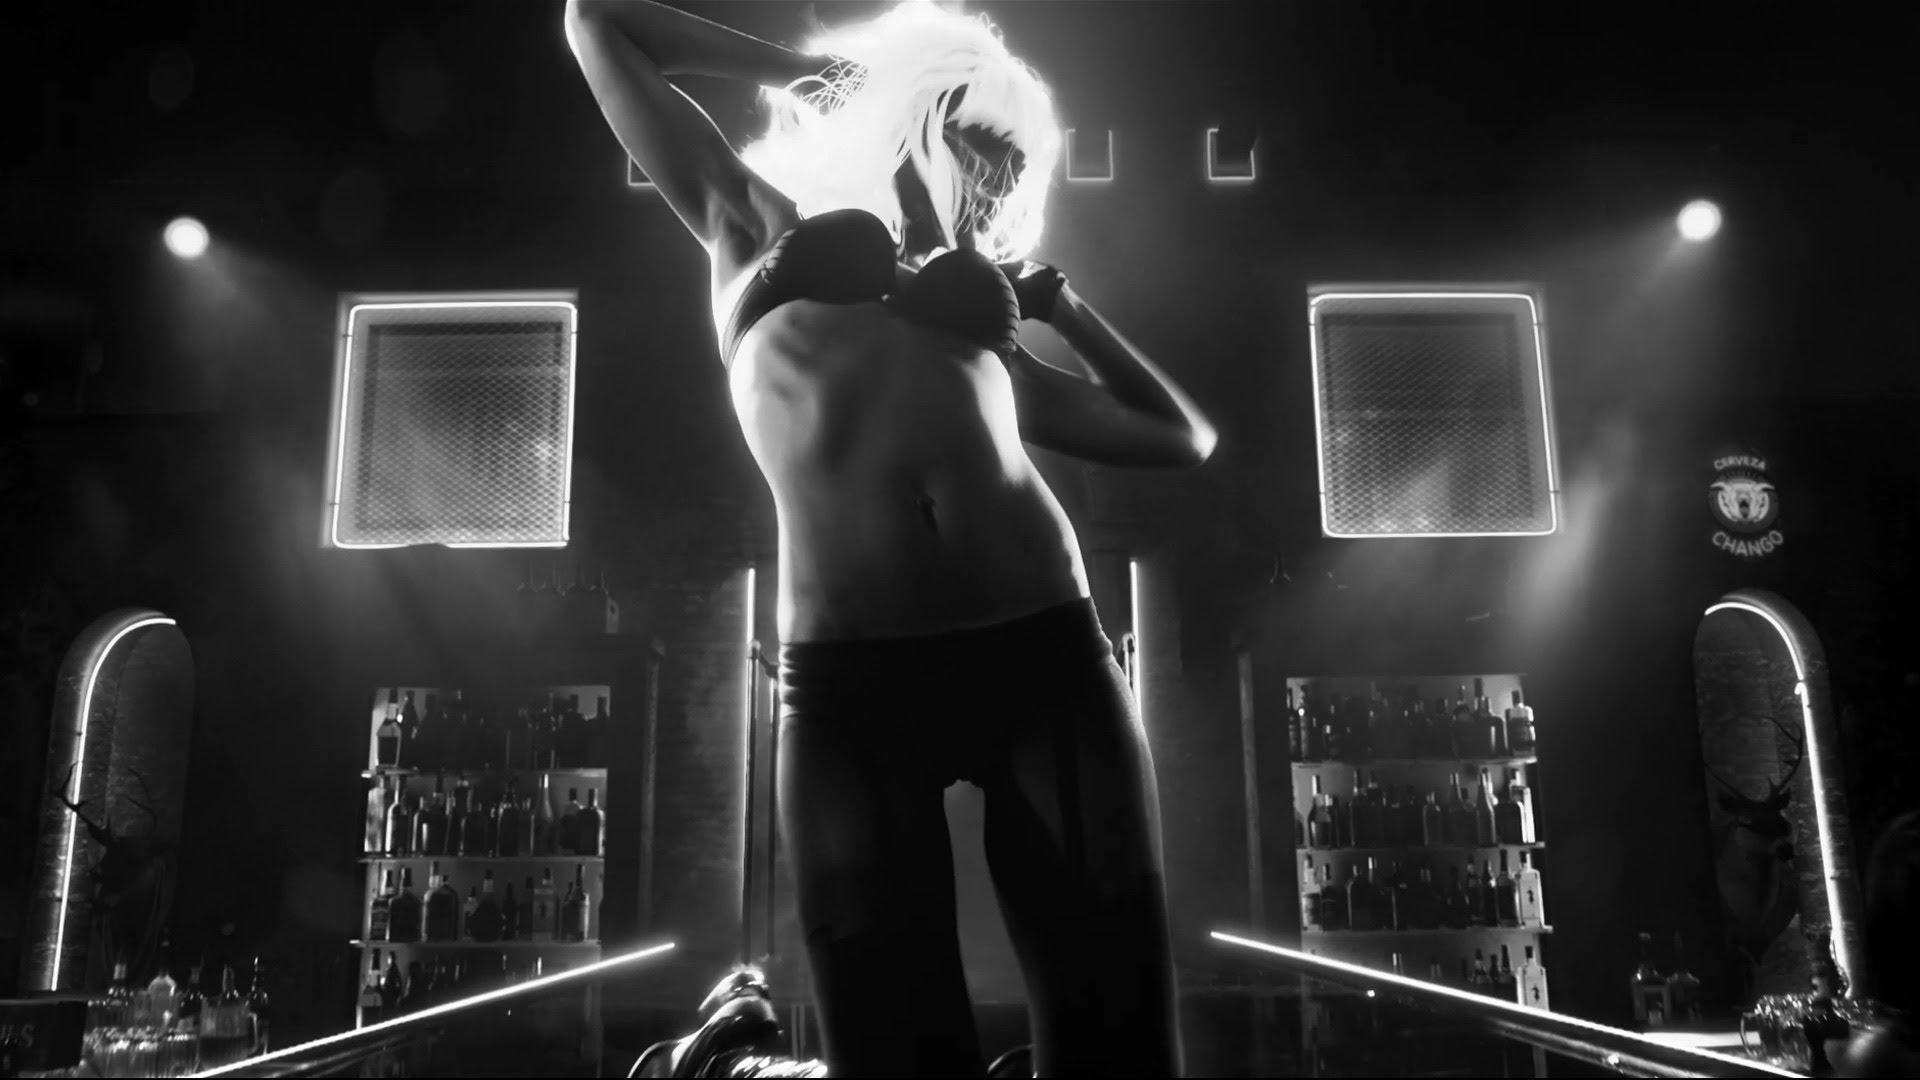 Город грехов 2 (Sin City A Dame to Kill For) Джессика Альба стриптиз танец